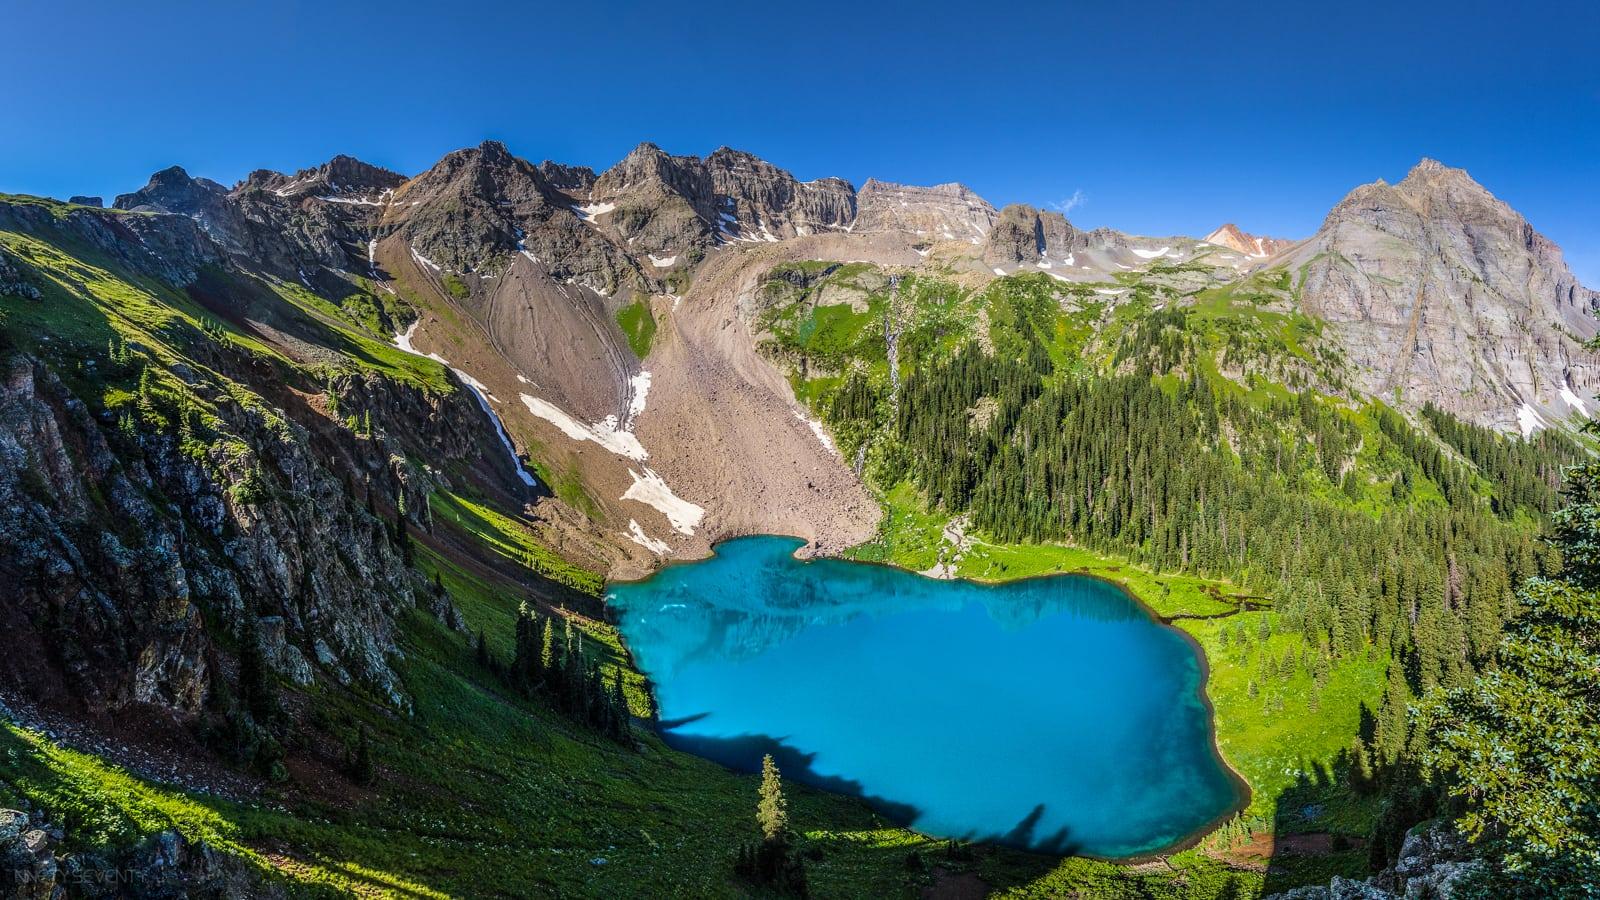 early-morning-above-lower-blue-lake.jpg